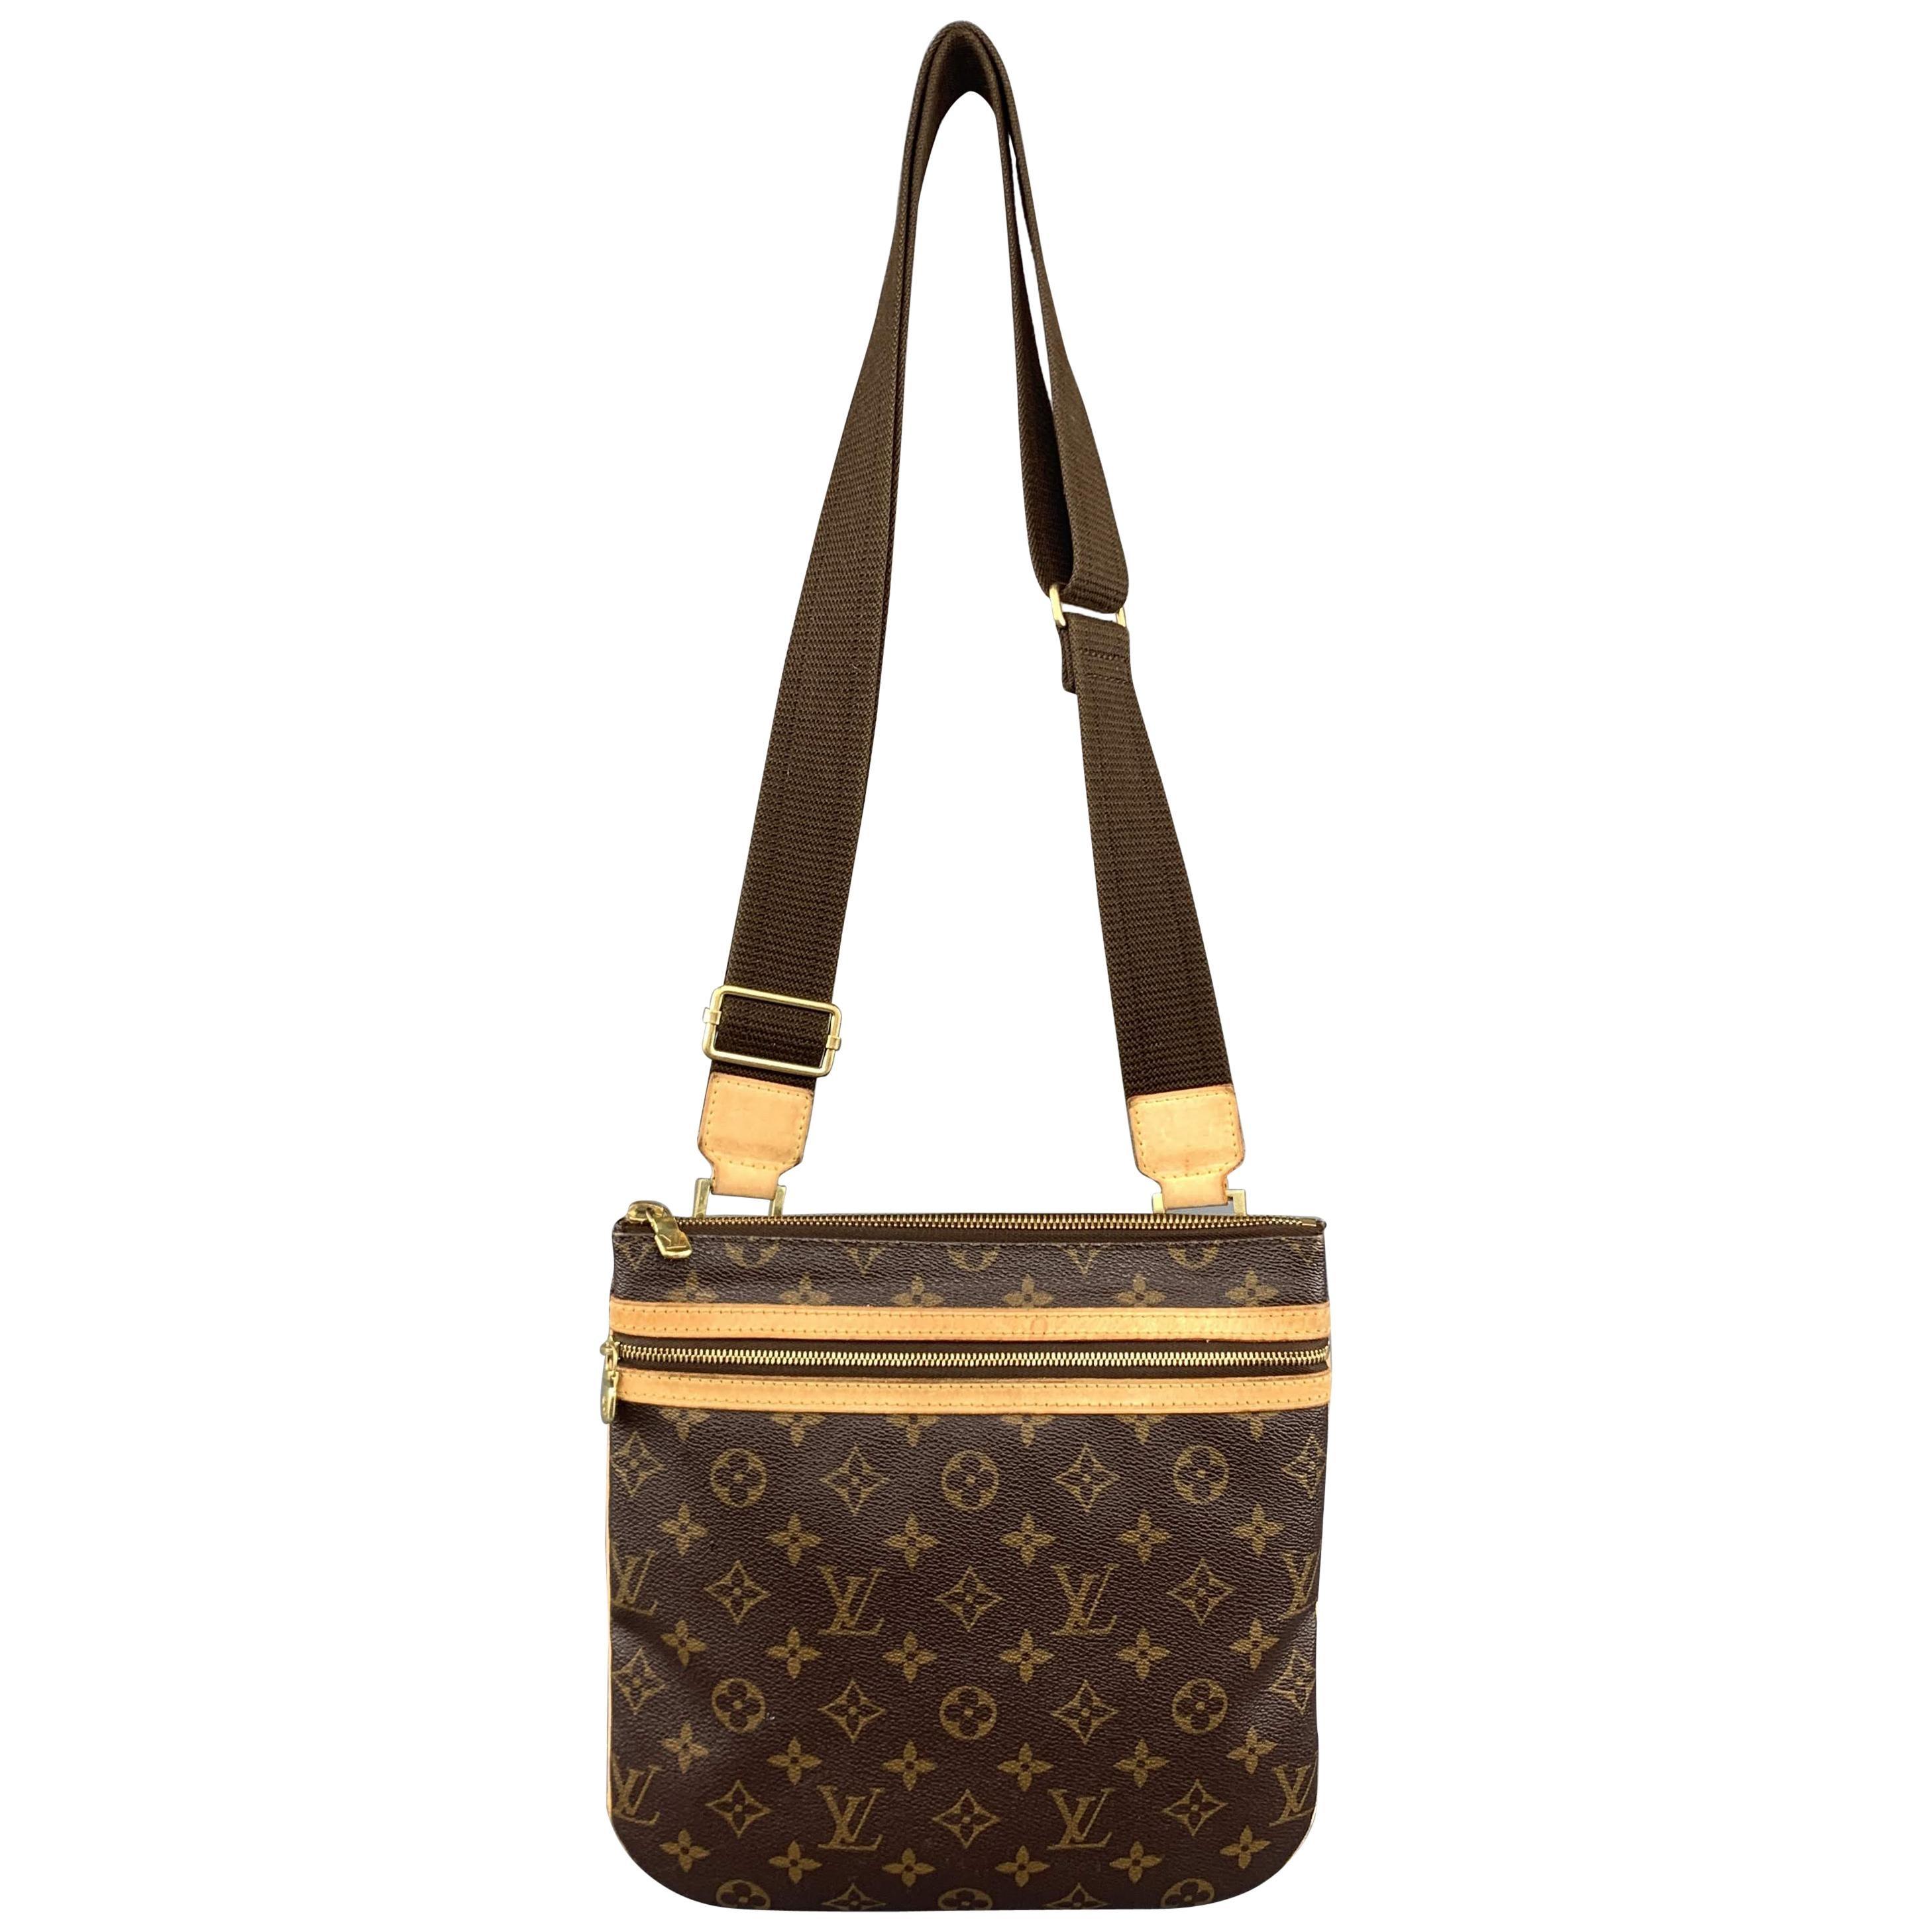 15109424cc53 LOUIS VUITTON Brown Monogram Pochette Bosphore Coated Canvas Crossbody Bag  at 1stdibs